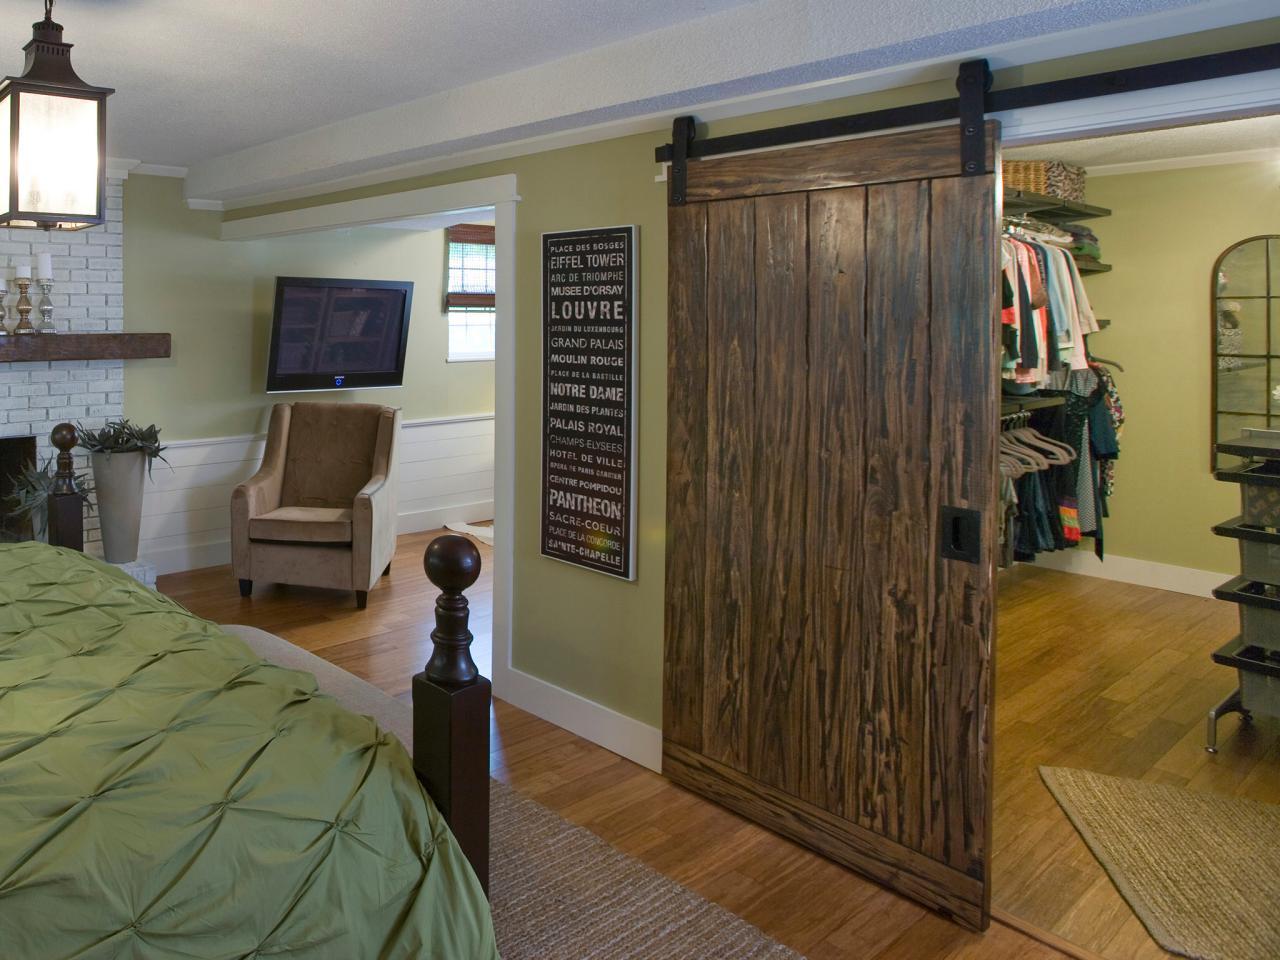 Closet Curtain Designs and Ideas | HGTV